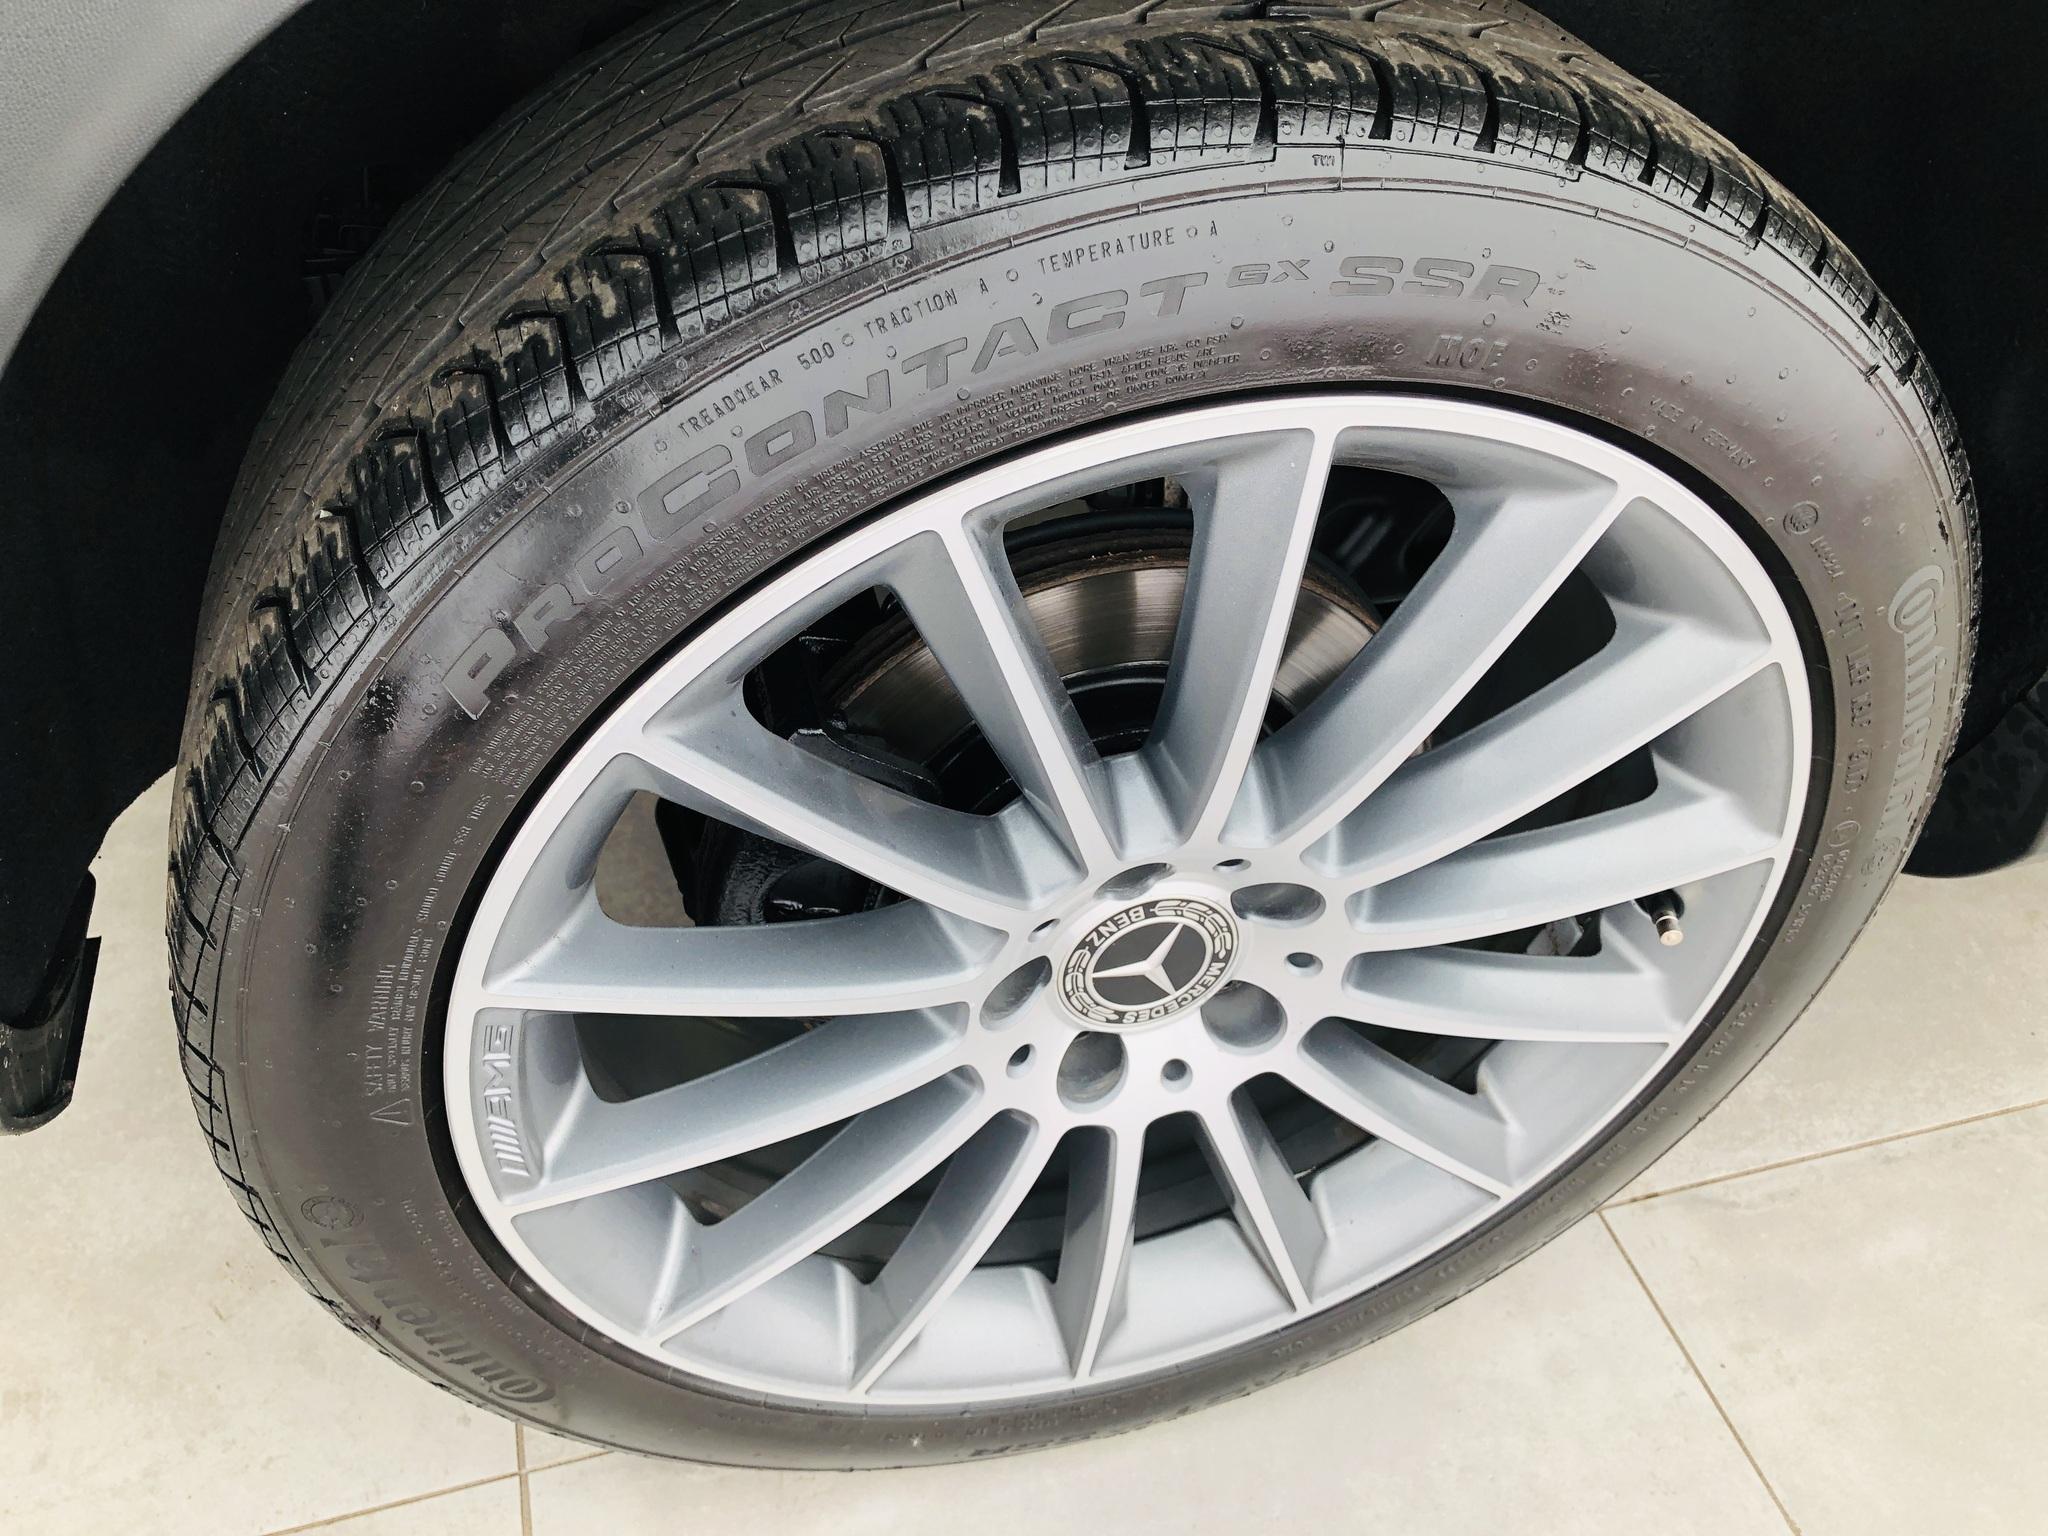 2018 Mercedes-Benz GLA-Class GLA250 4MATIC Garantie Mercedes 23/10/2023 / 160km complet